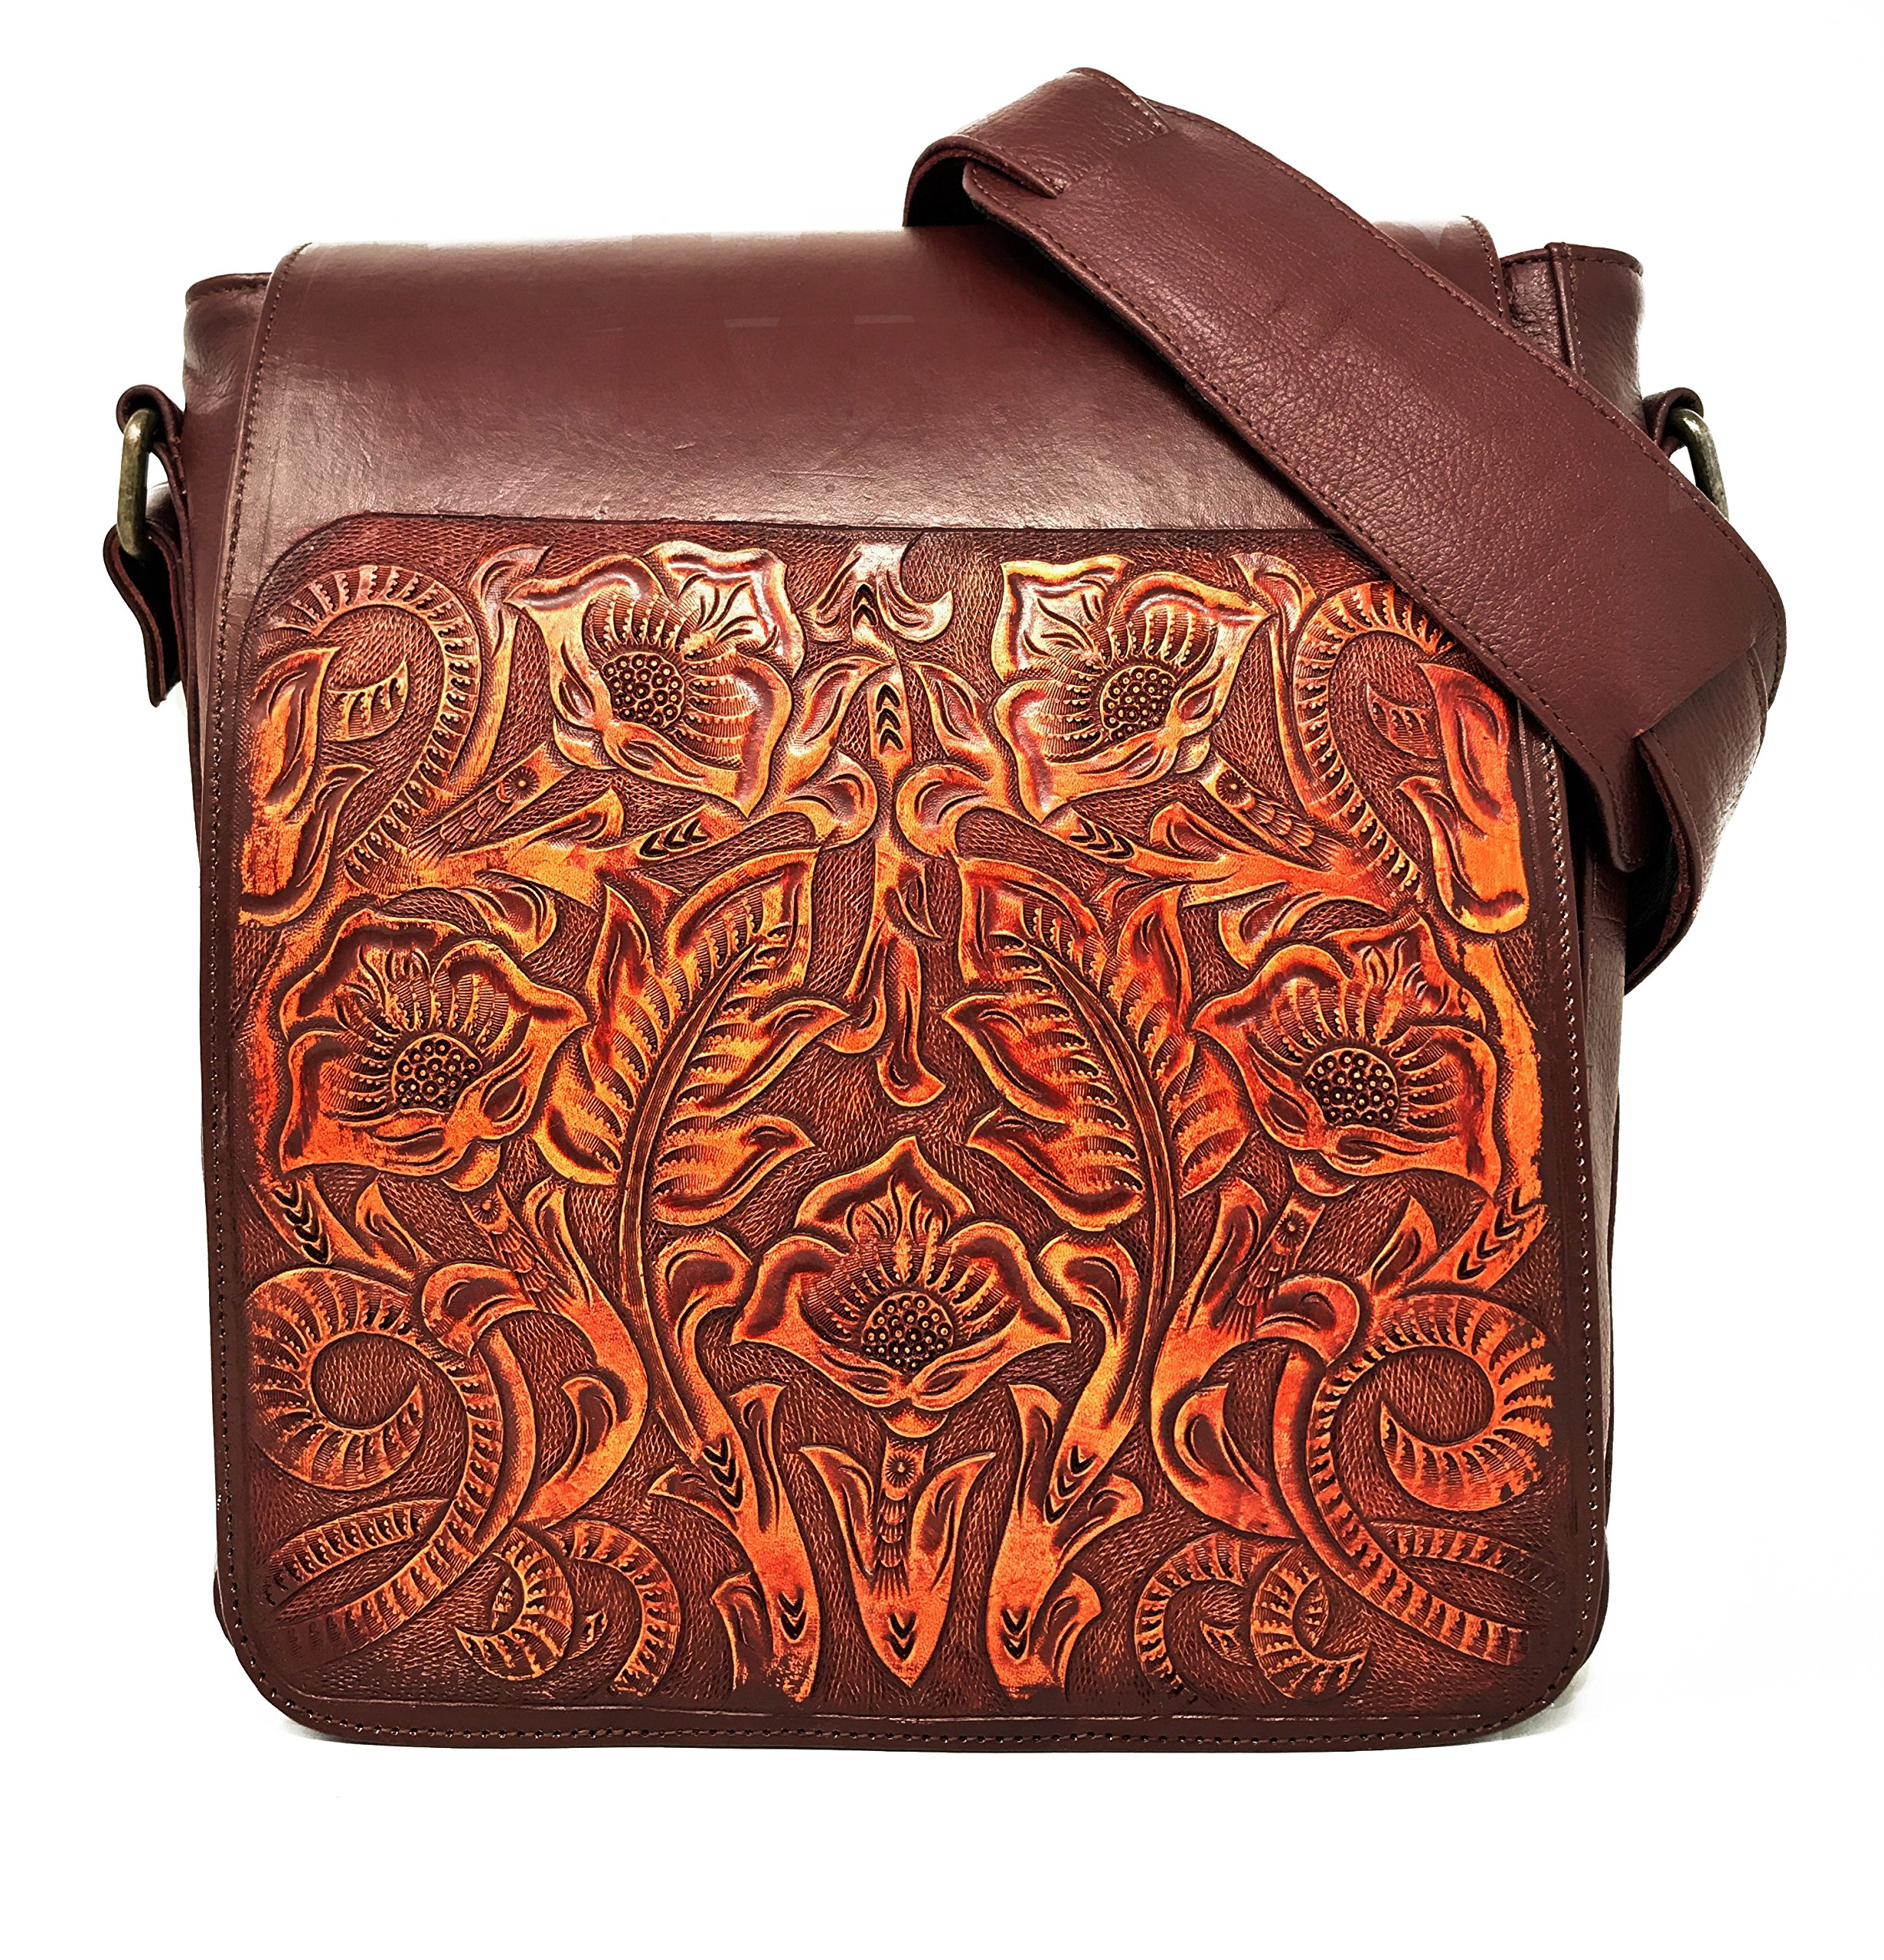 Juno Vintage Floral Artisan Leather Handmade Adjustable Messenger Cross Body Handbag Designer Gift for Women (Cocobolo) by Mauzari Sayulita